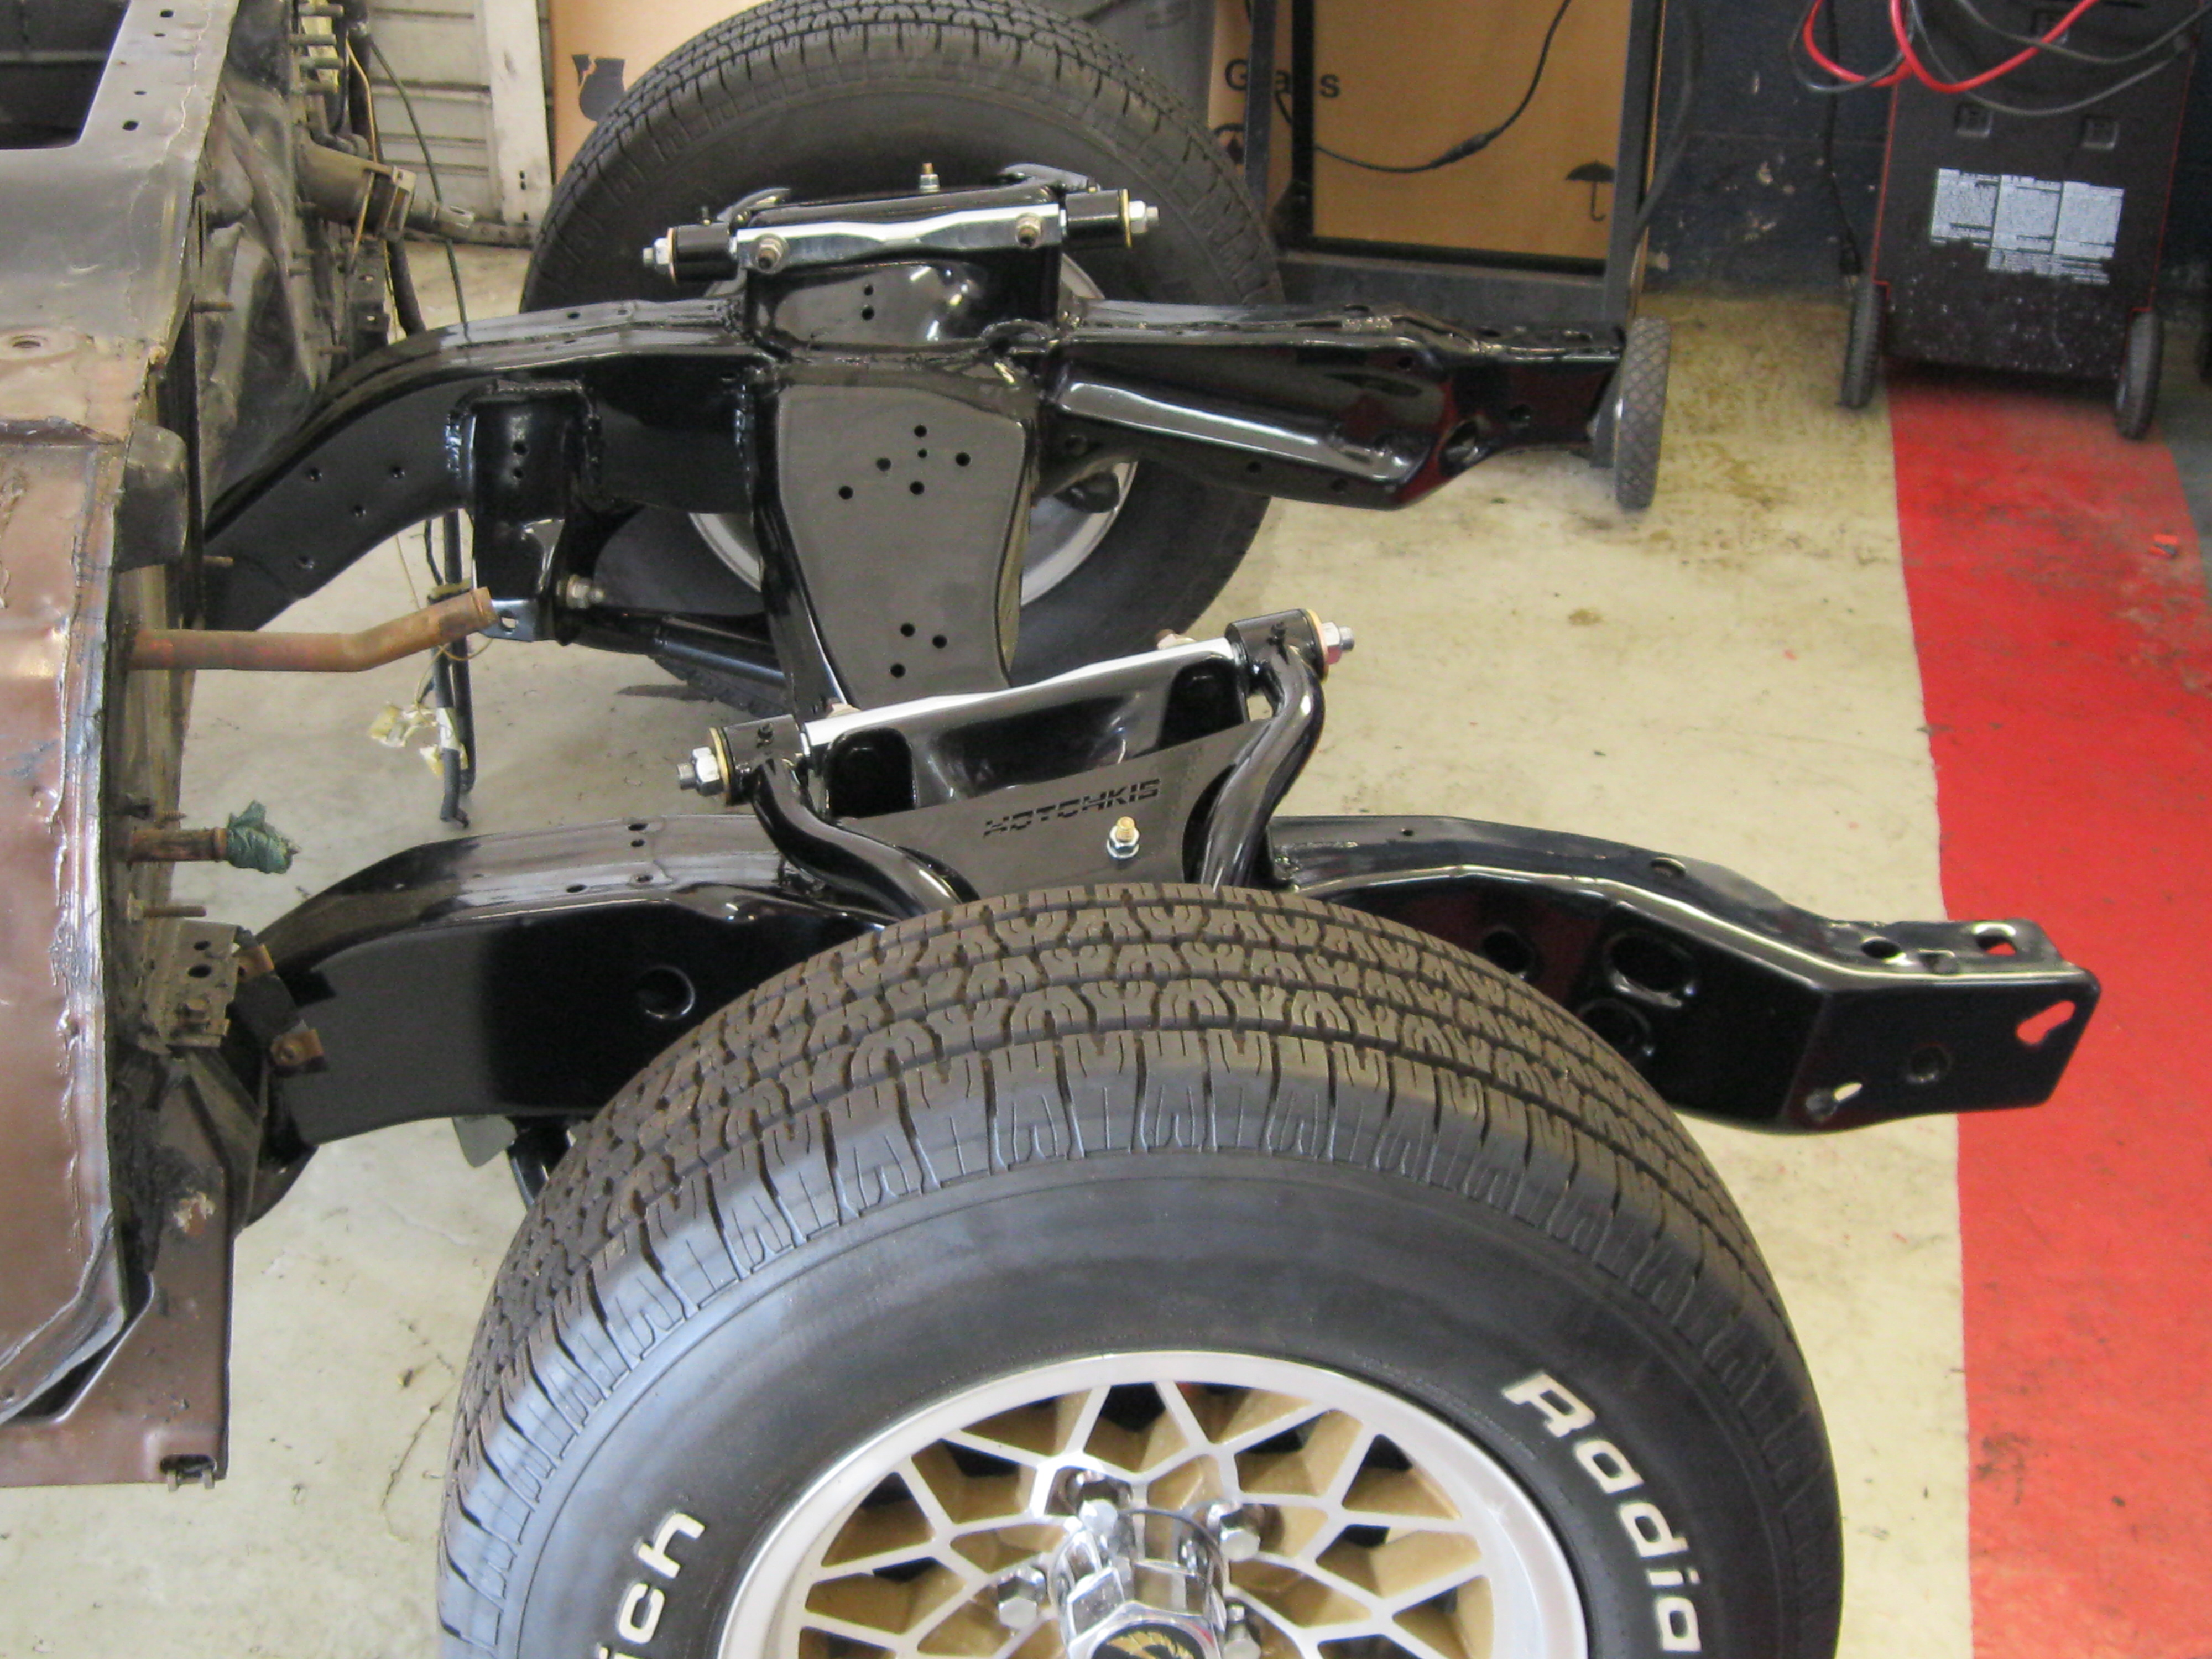 1979 Trans Am Frame - Wilson\'s Auto Restoration Blog - Wilson\'s Auto ...